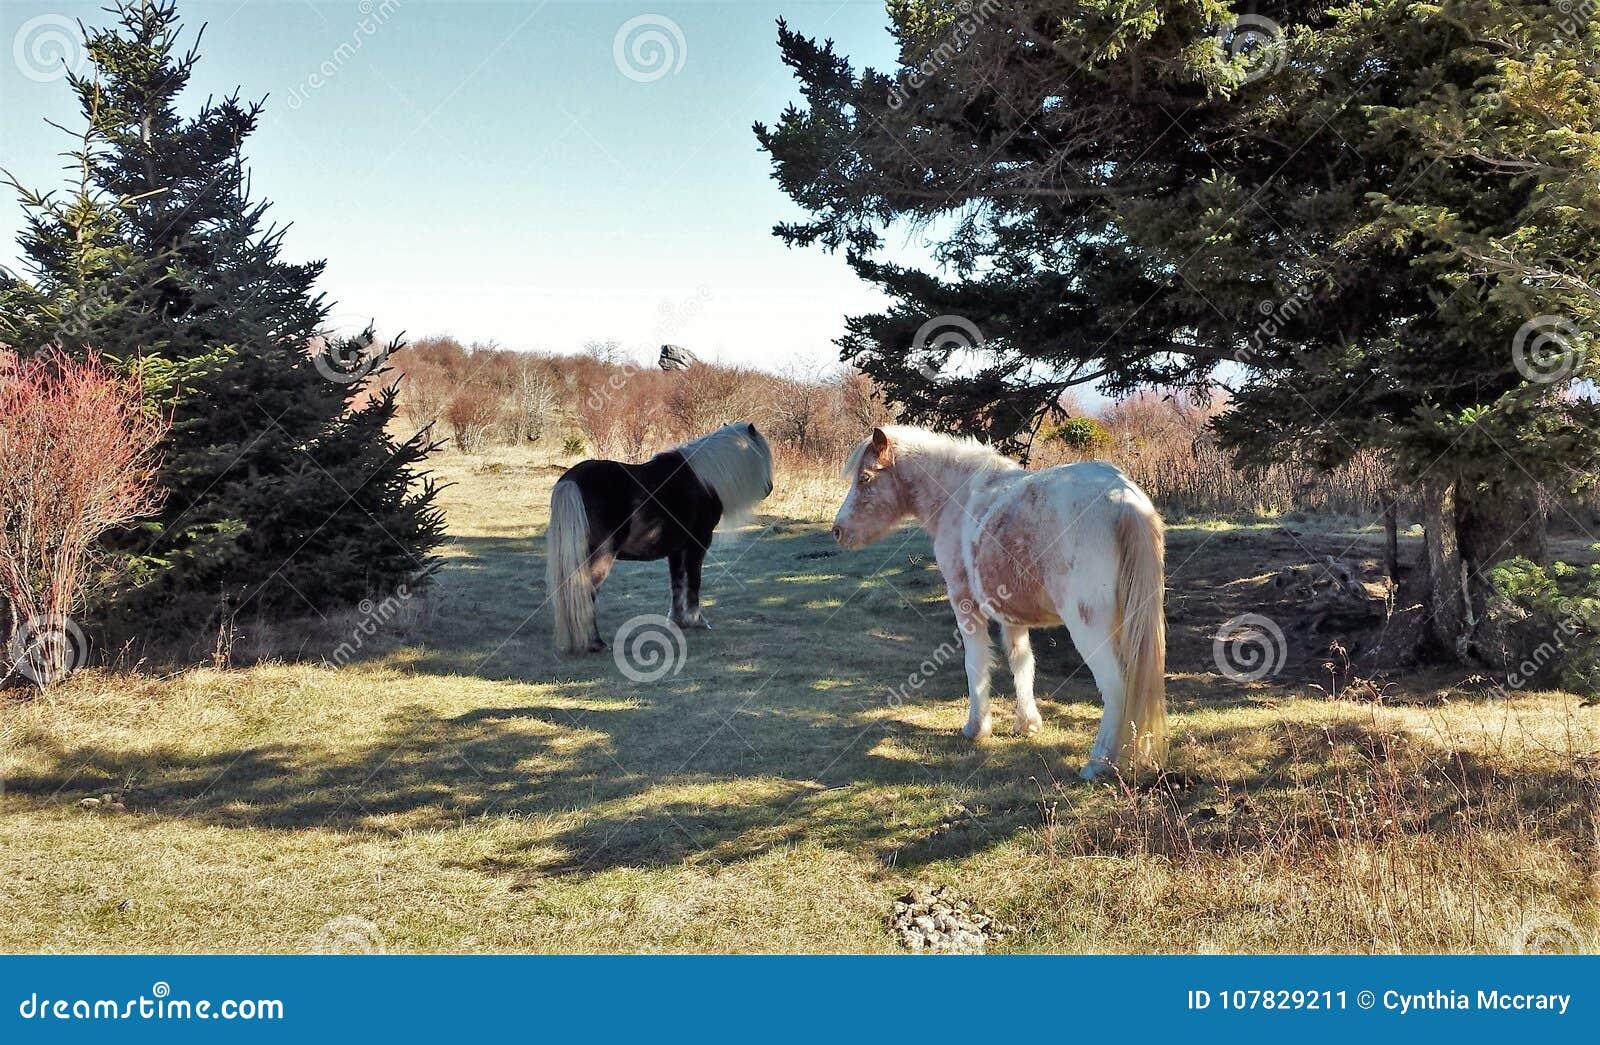 grayson highlands wild ponies stock image image of fabio pony